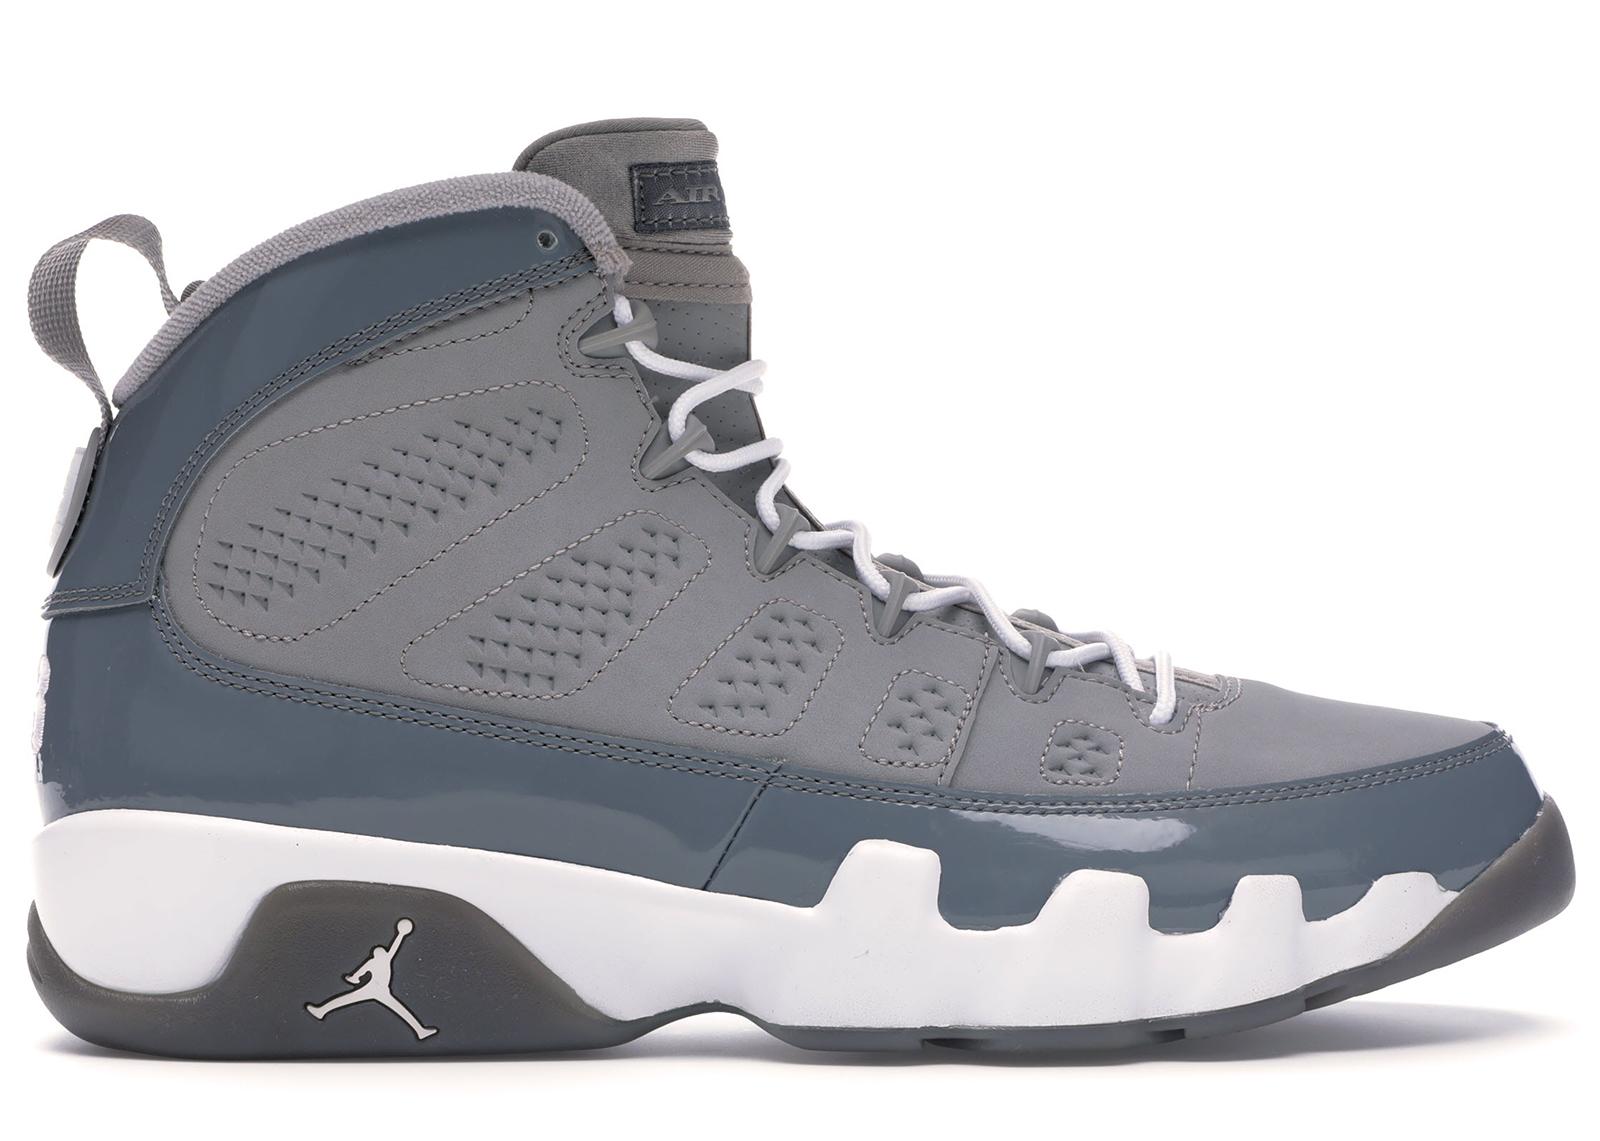 Jordan 9 Retro Cool Grey (2012